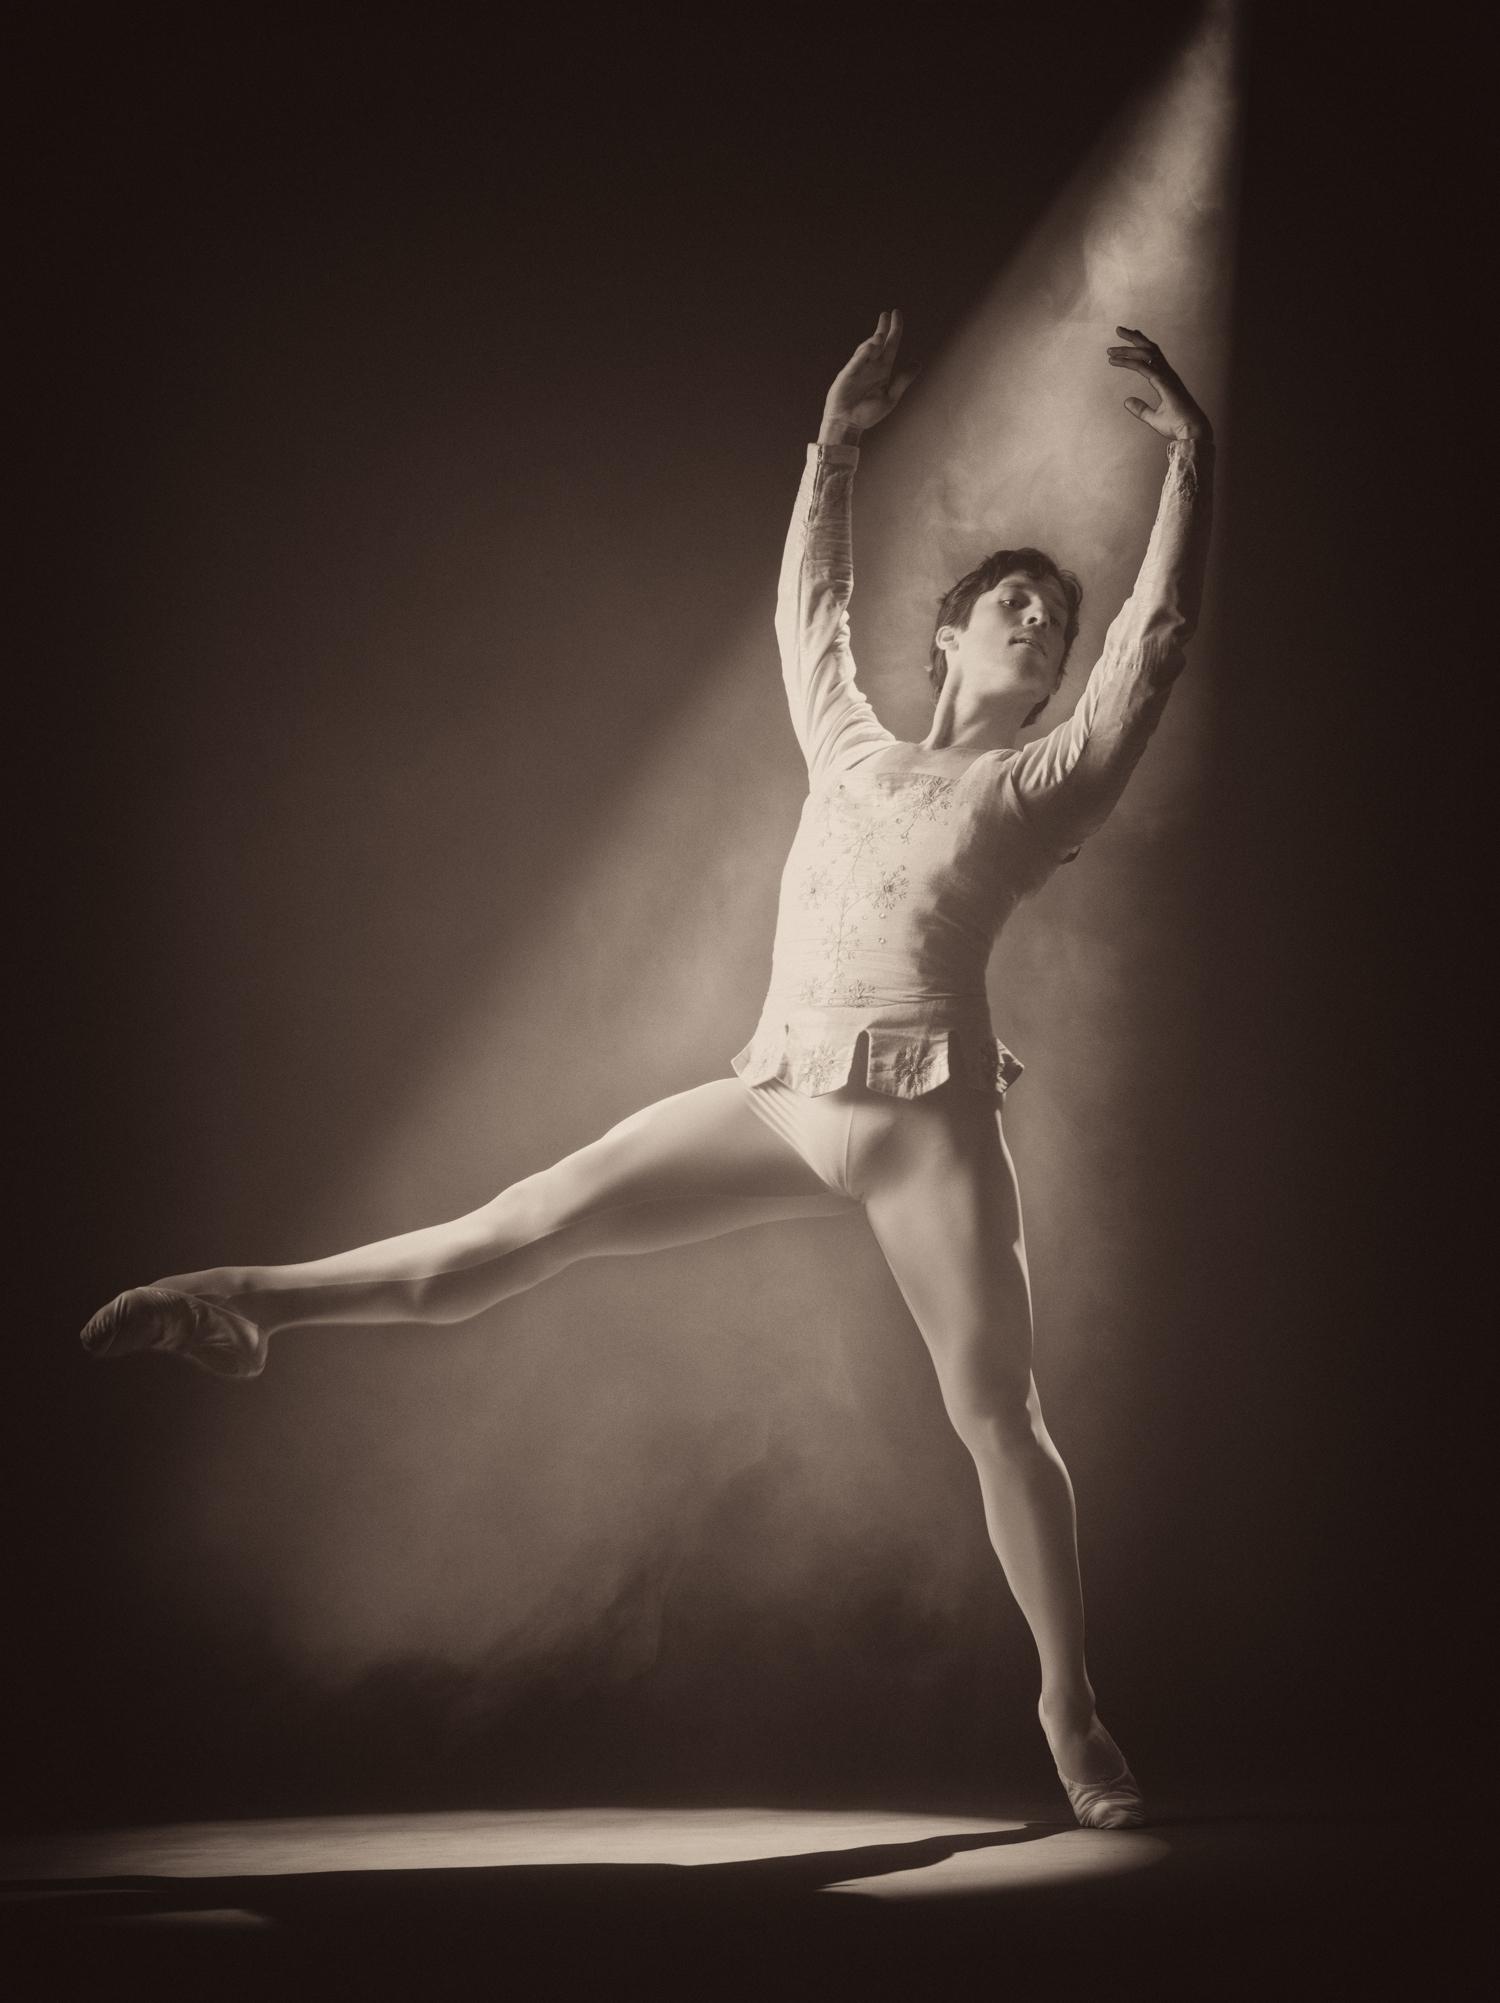 birnbach-dance_photo-20130210-9807.jpg